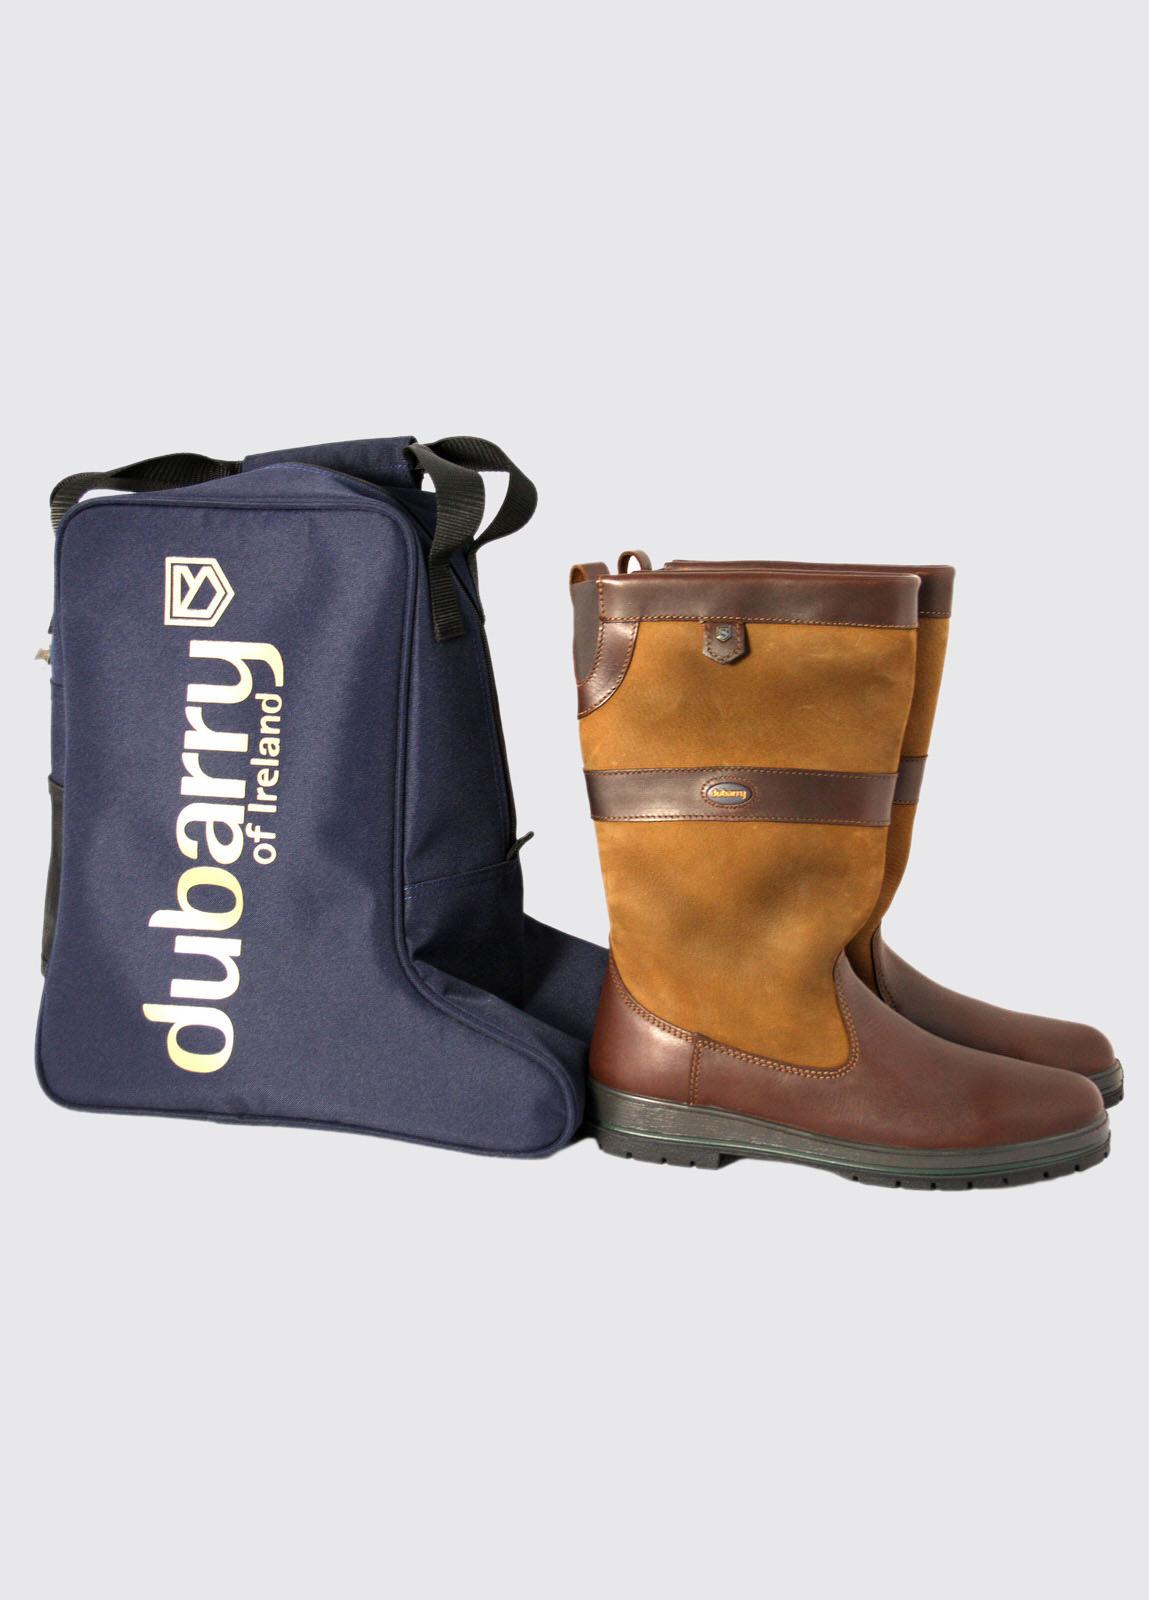 Glenlo Medium Boot Bag